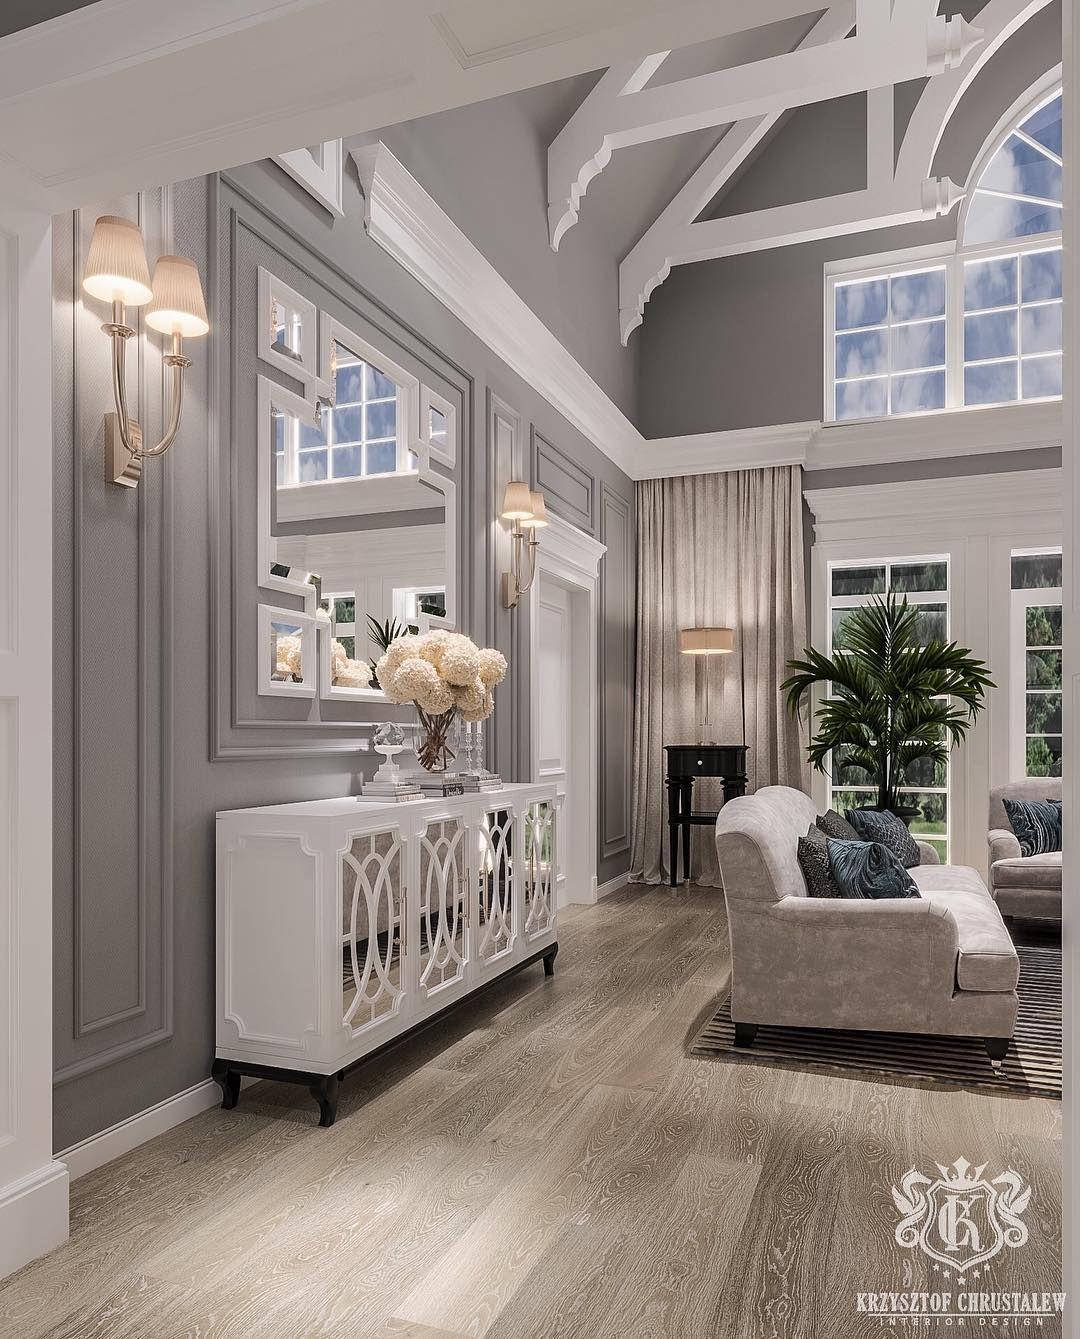 Kc Design On Instagram Newproject Interiordesign Design Designer Krzysztofchrustal Elegant Living Room Design Luxury Living Room Open Living Room Design